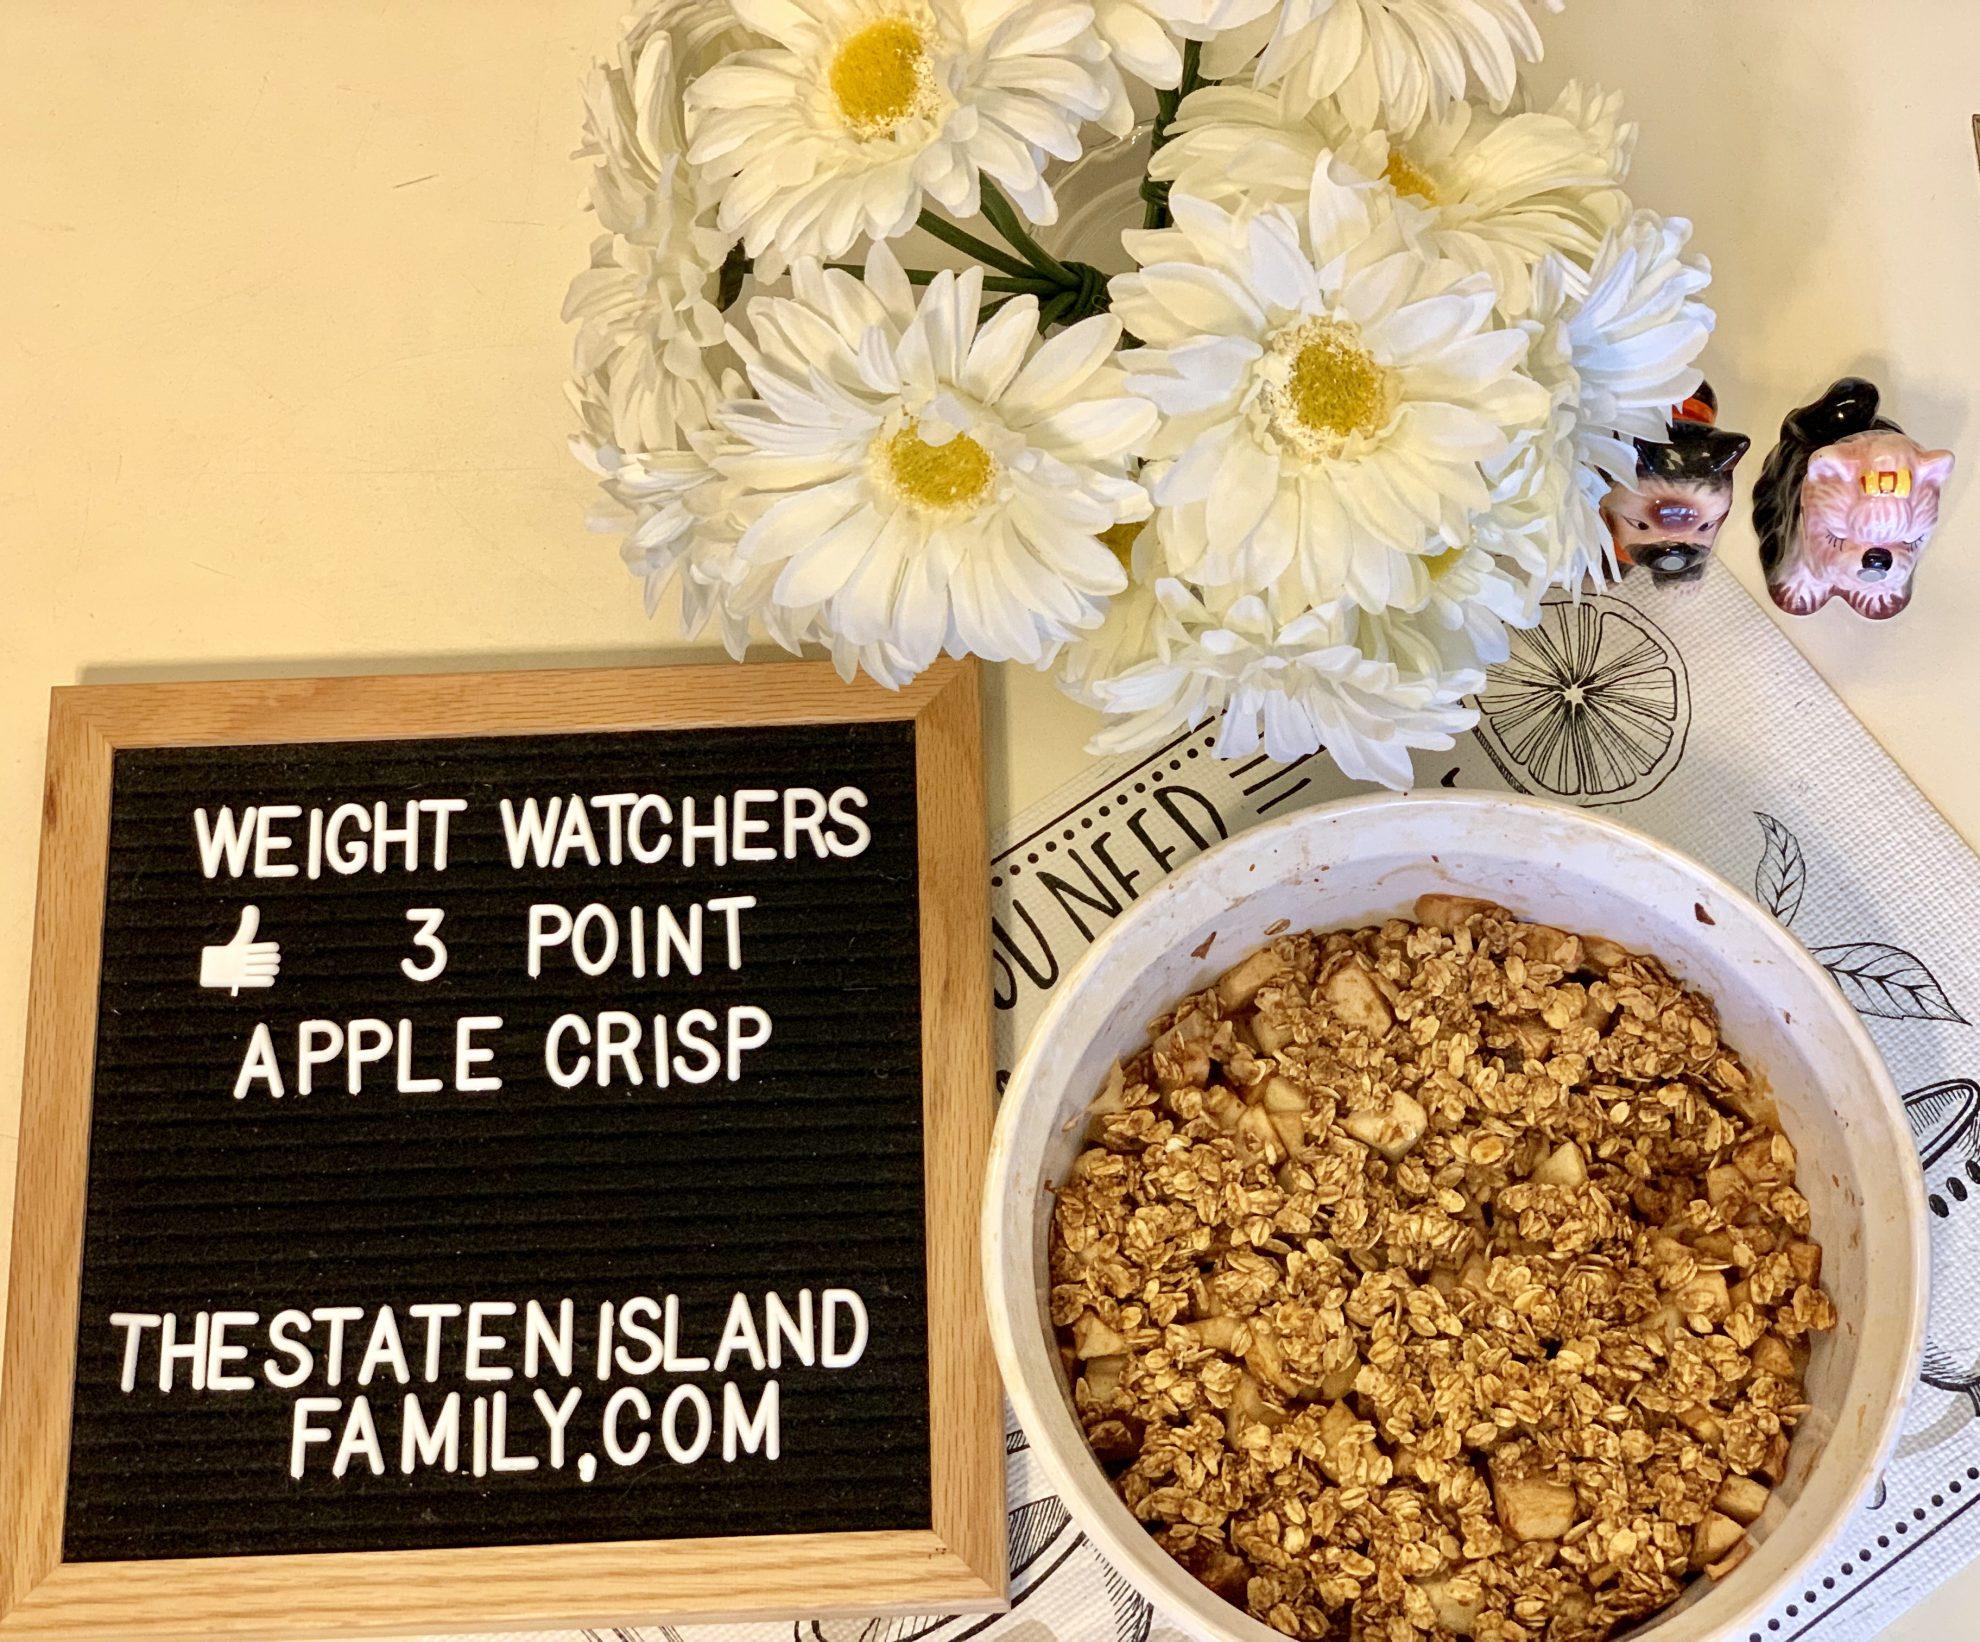 Weight Watchers Apple Crisp - Just 3 points per serving